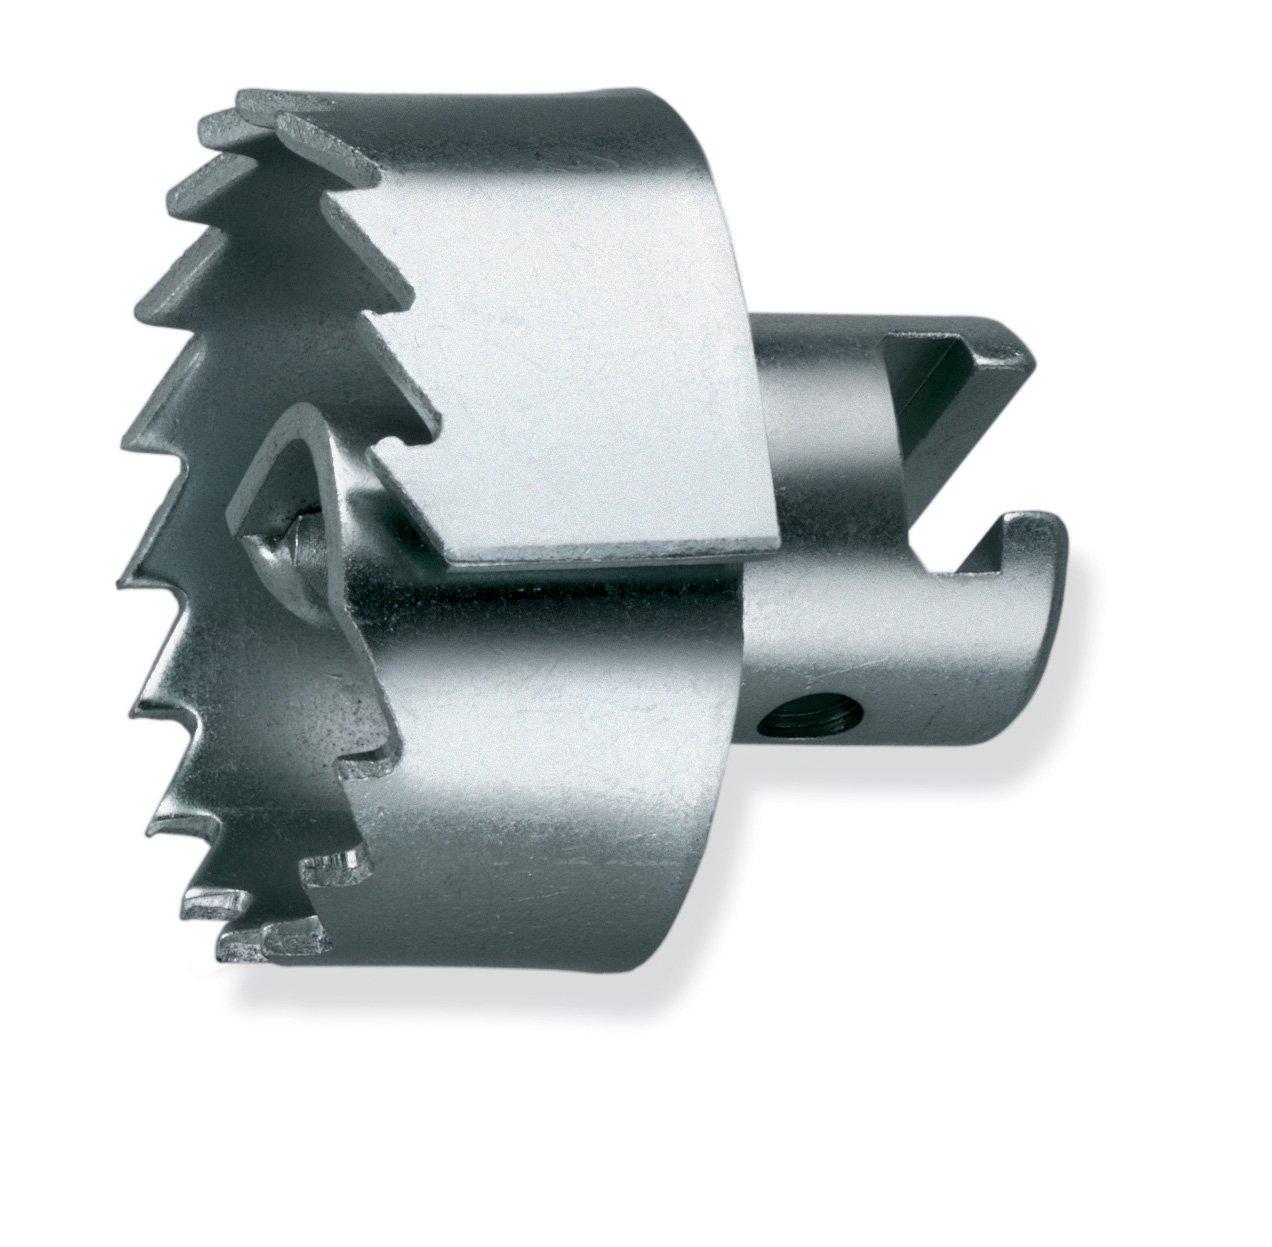 Rothenberger 72166 Spiral Sawtooth Cutter, 5/8-Inch